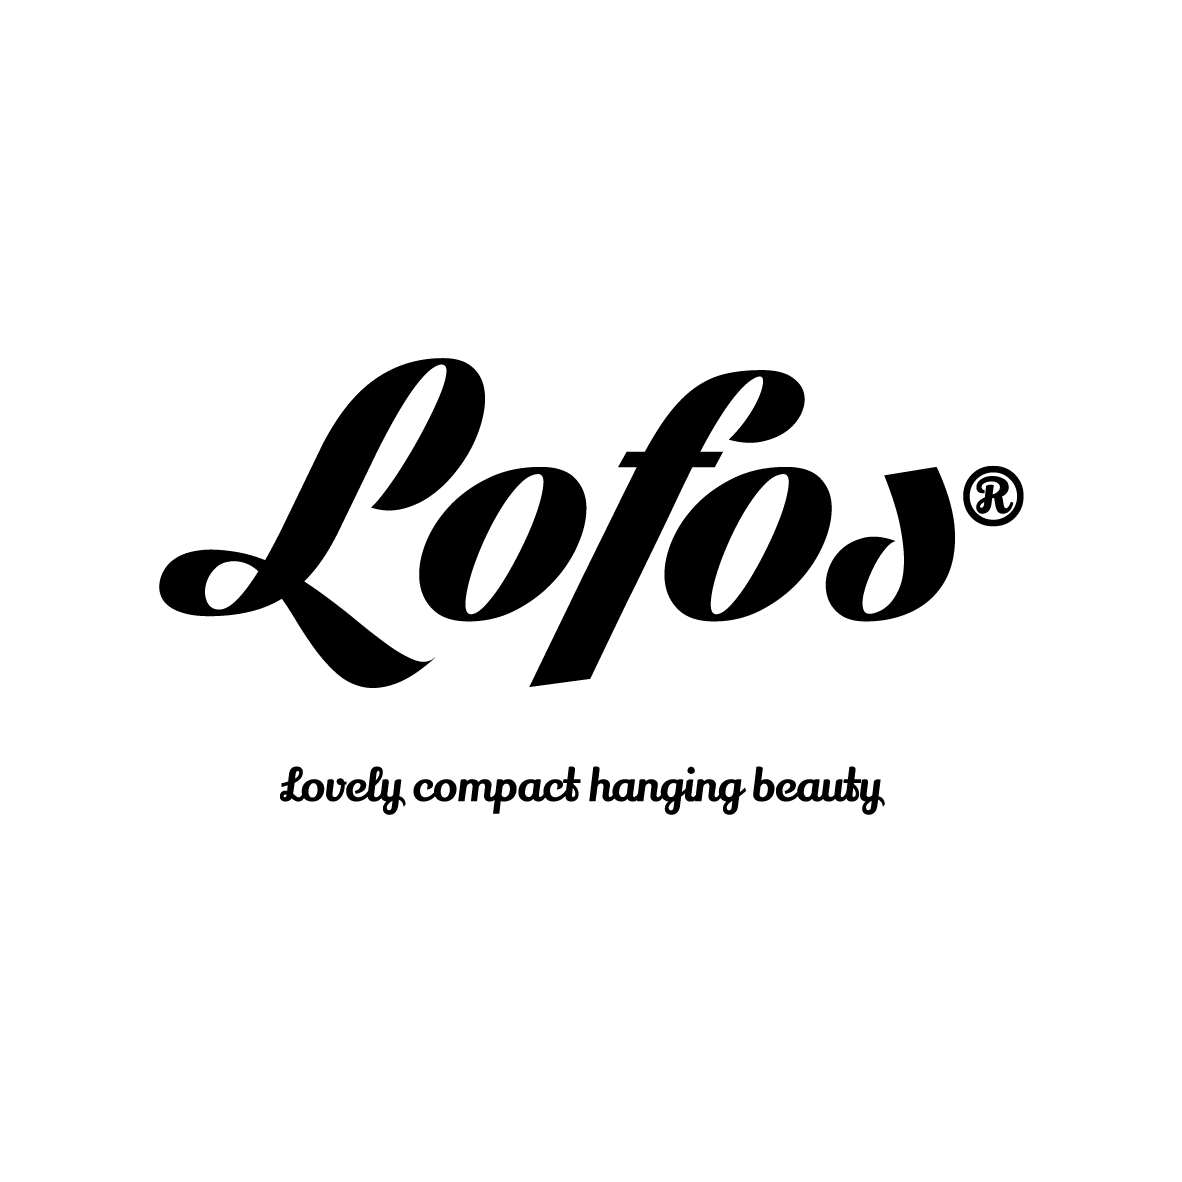 Lofos logo black